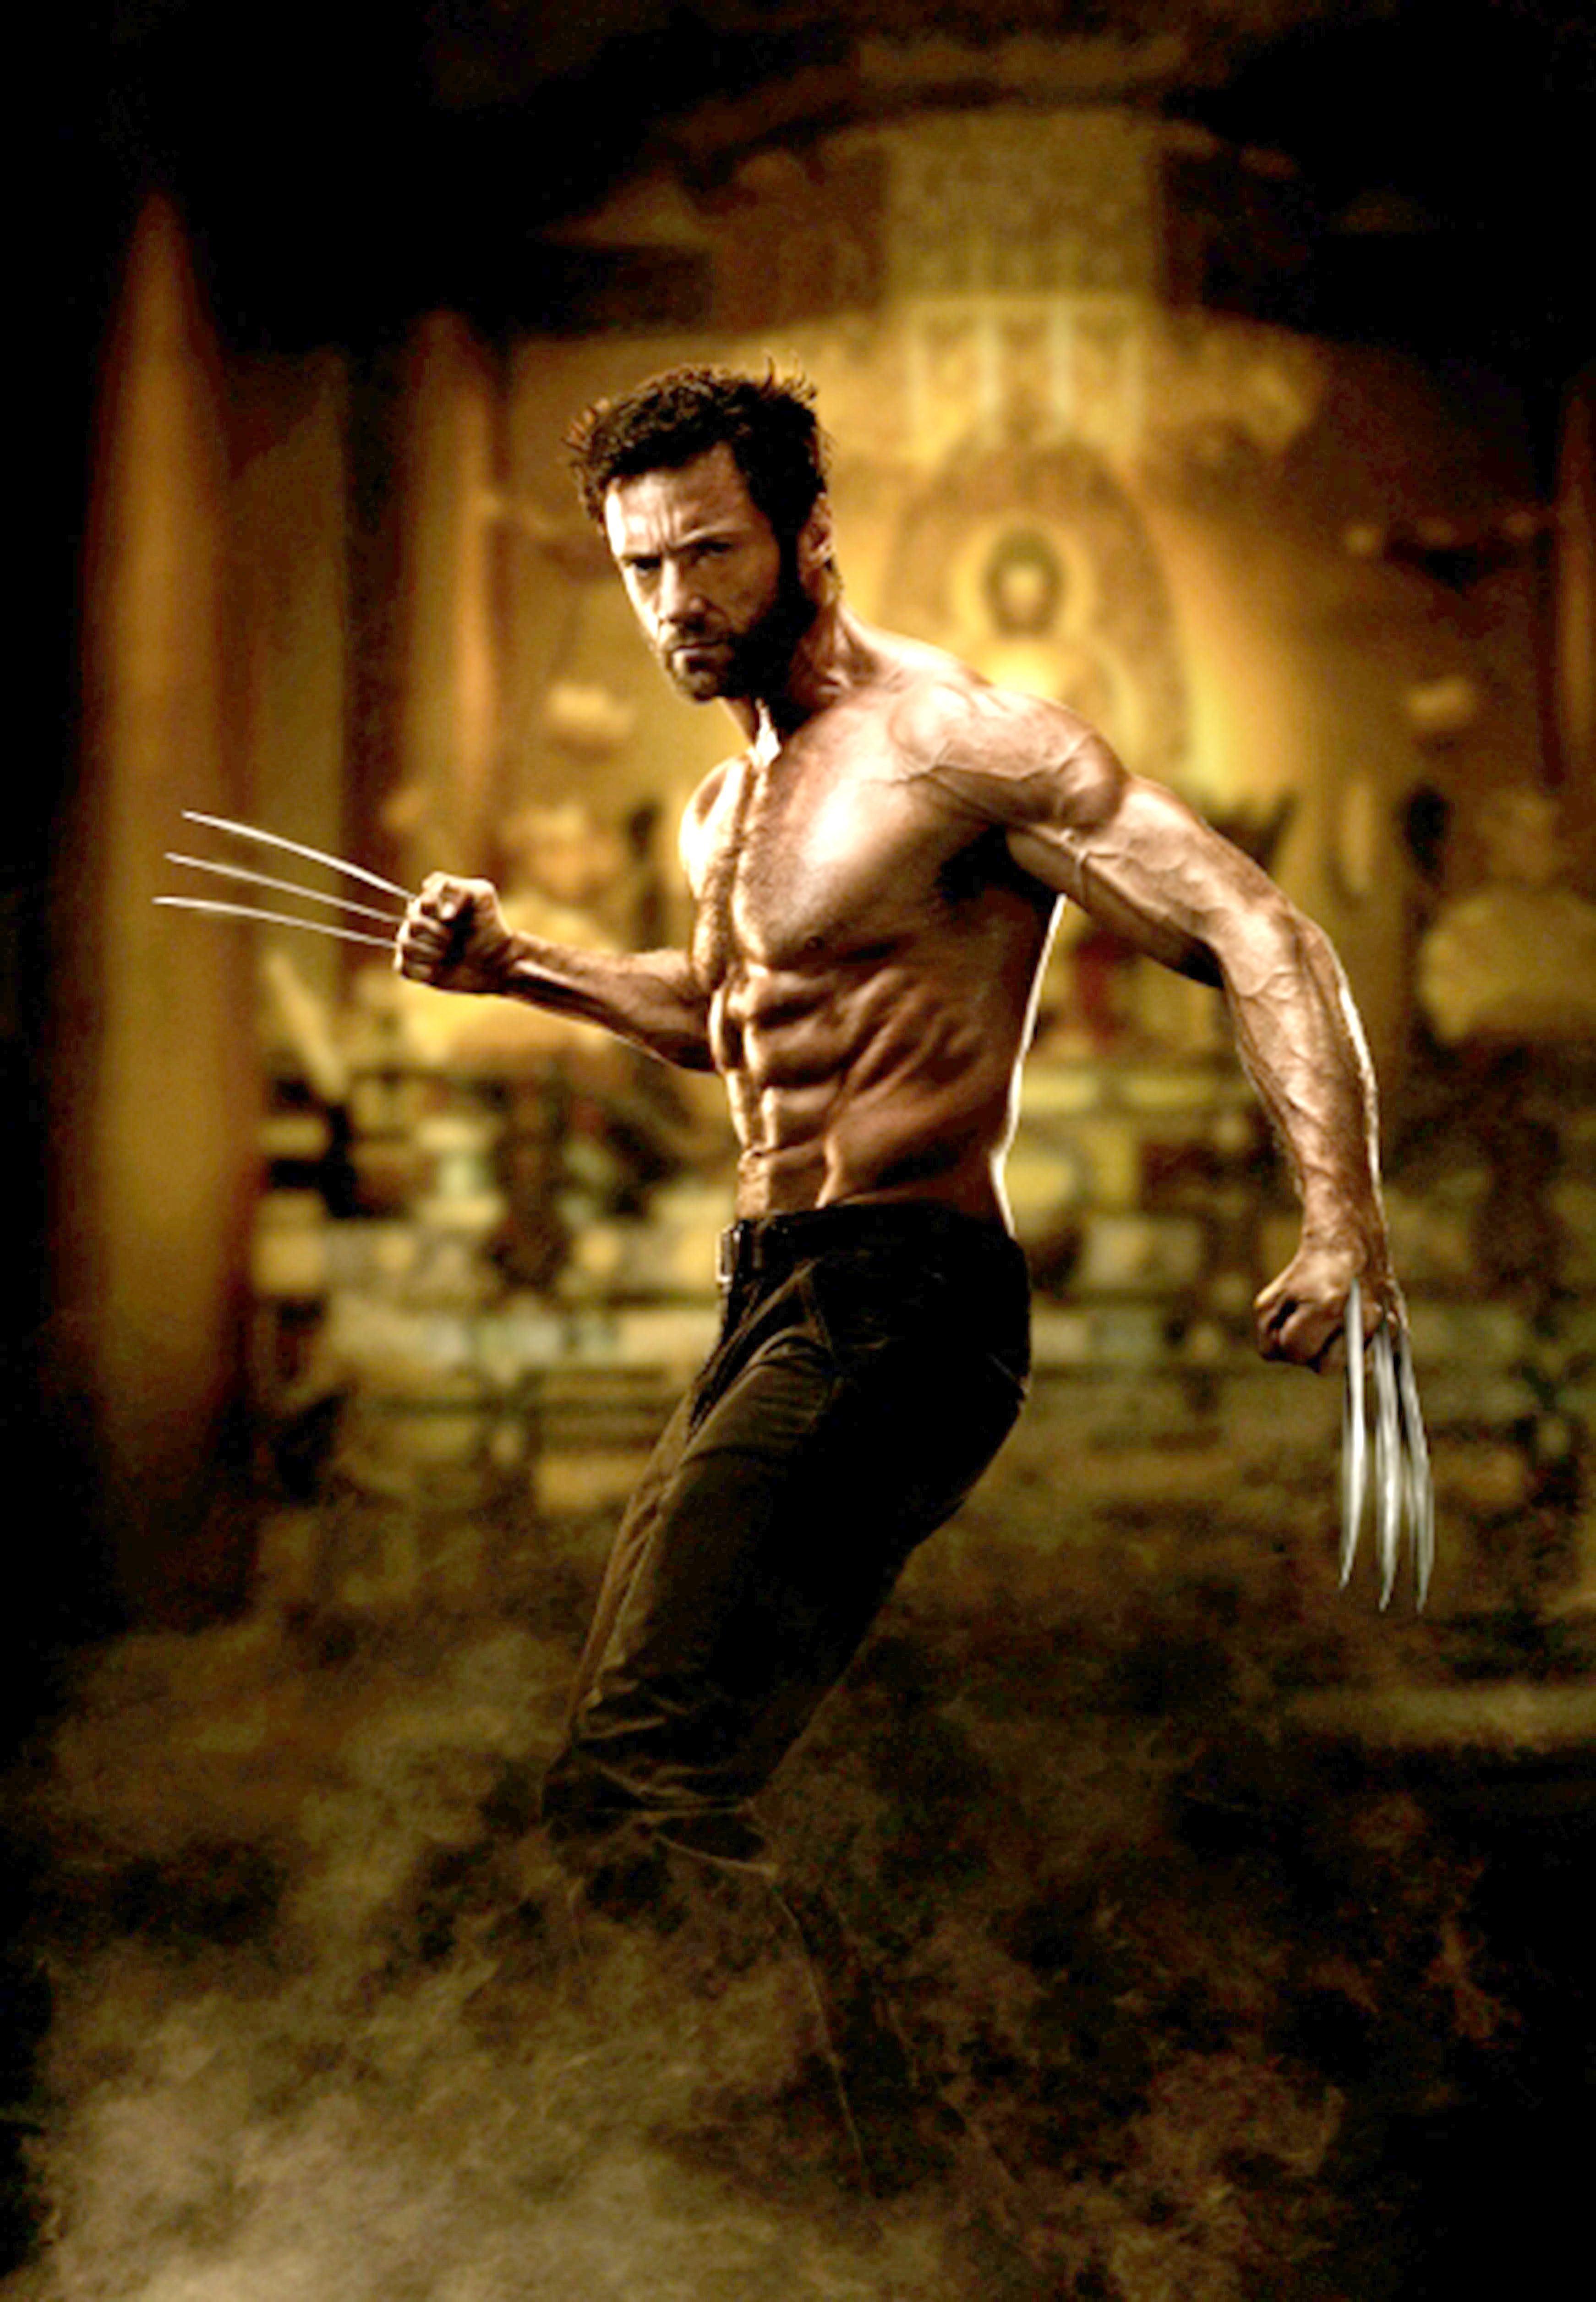 4. Wolverine aka Logan